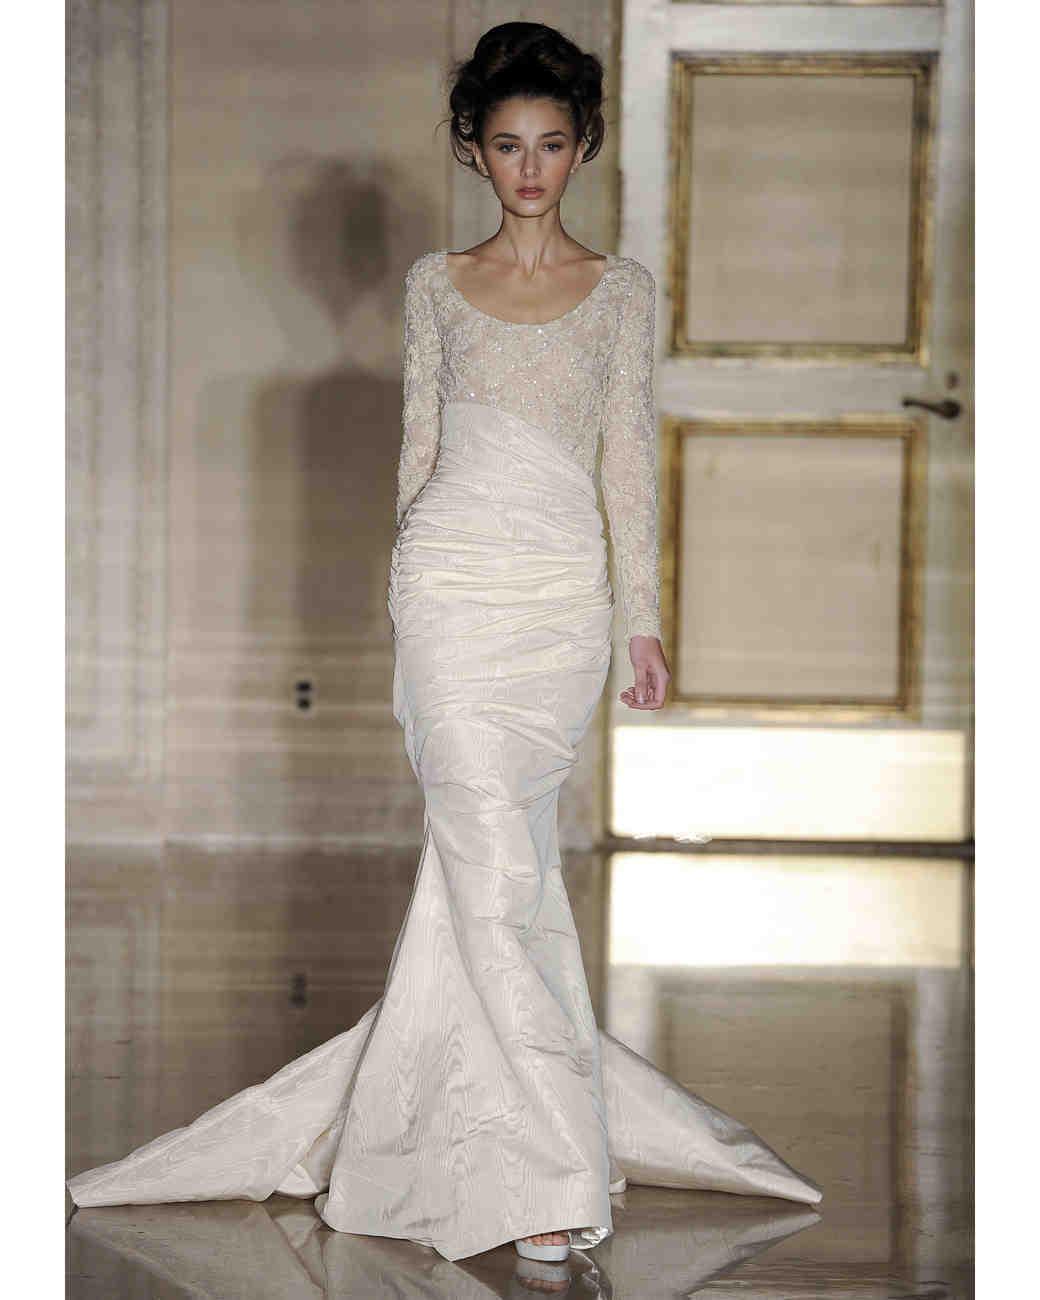 Long Sleeve Wedding Dresses, Fall 2013